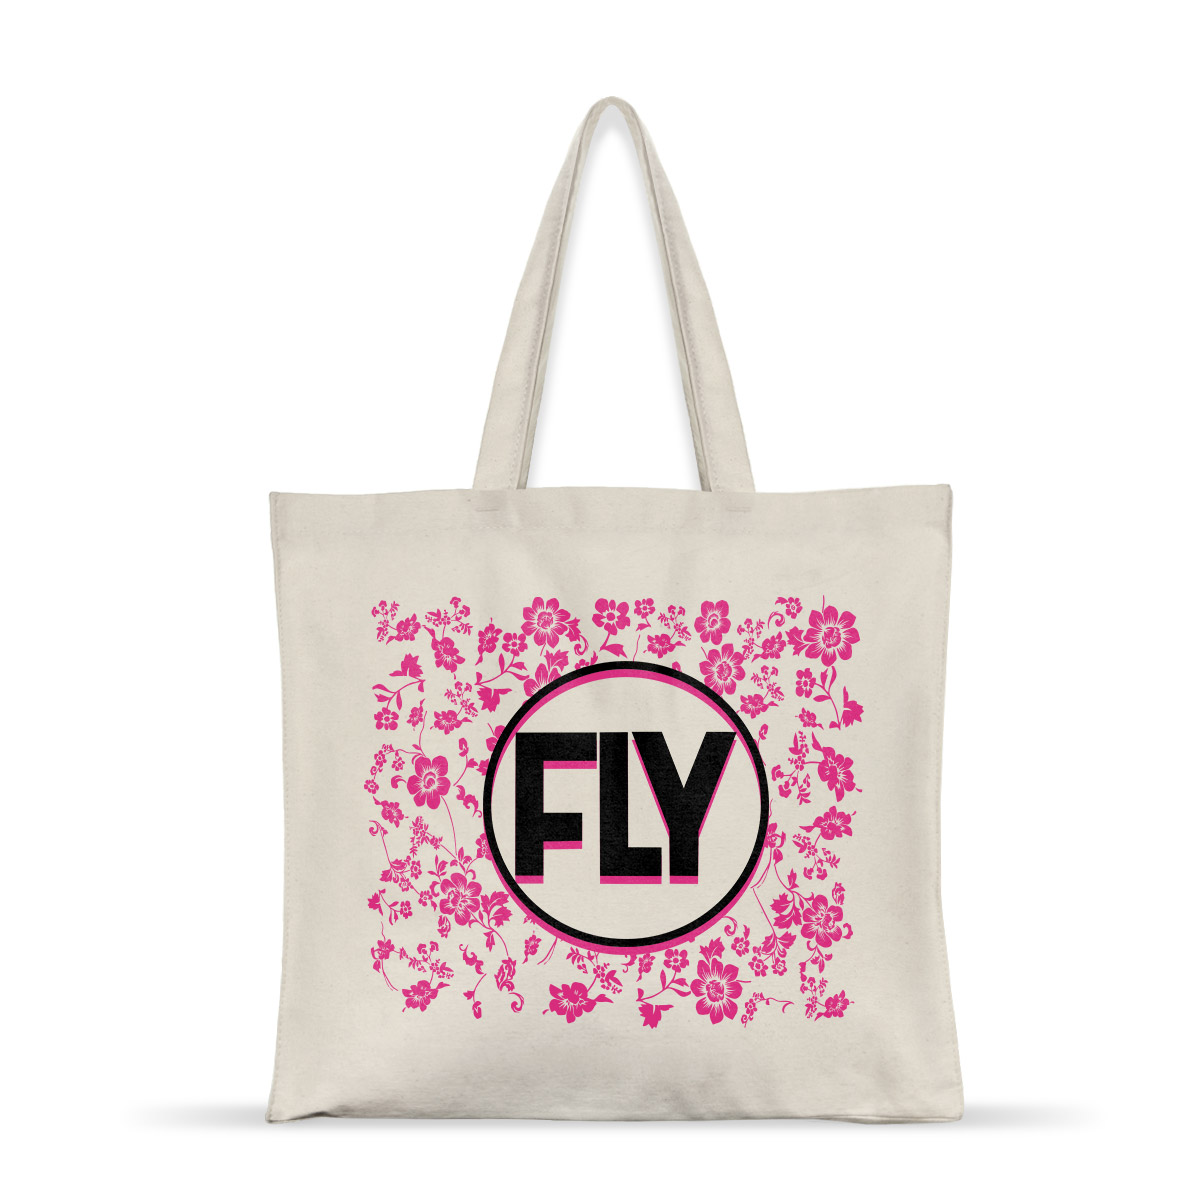 Ecobag Banda Fly Pink Flowers